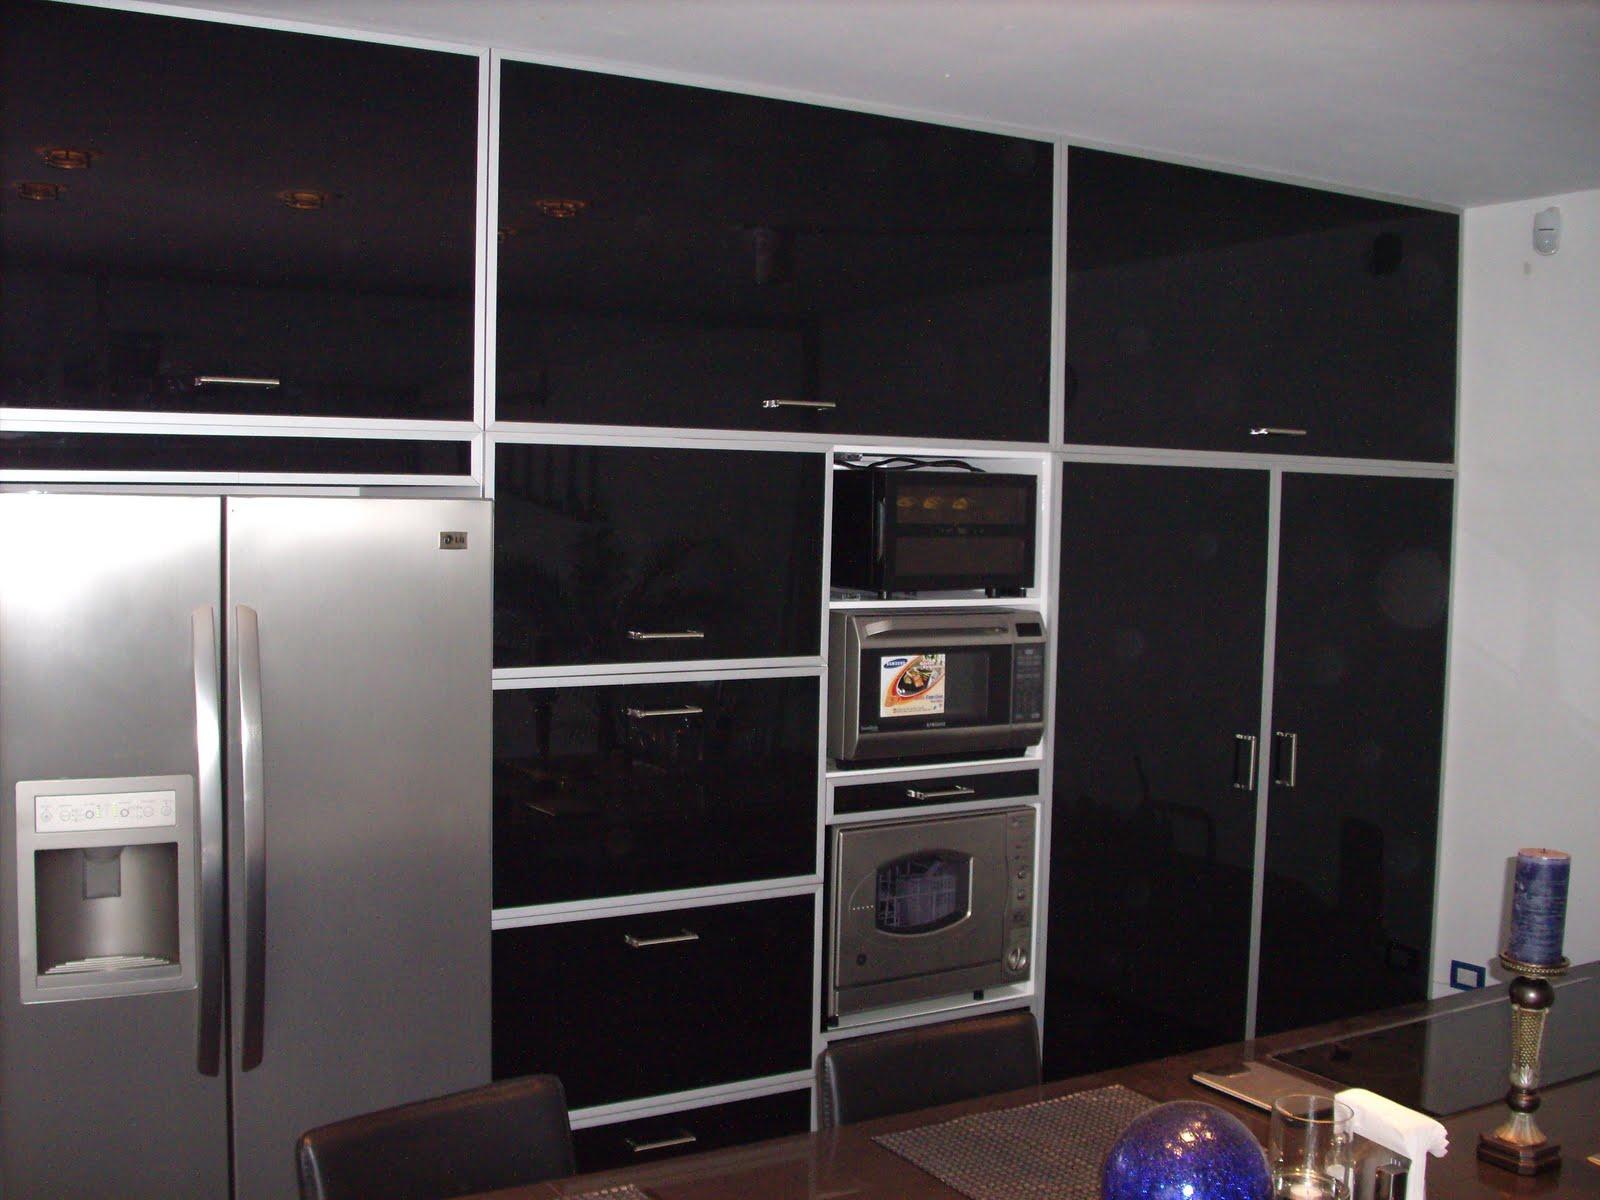 Heynez cocinas modernas abril 2010 for Puertas de frente modernas